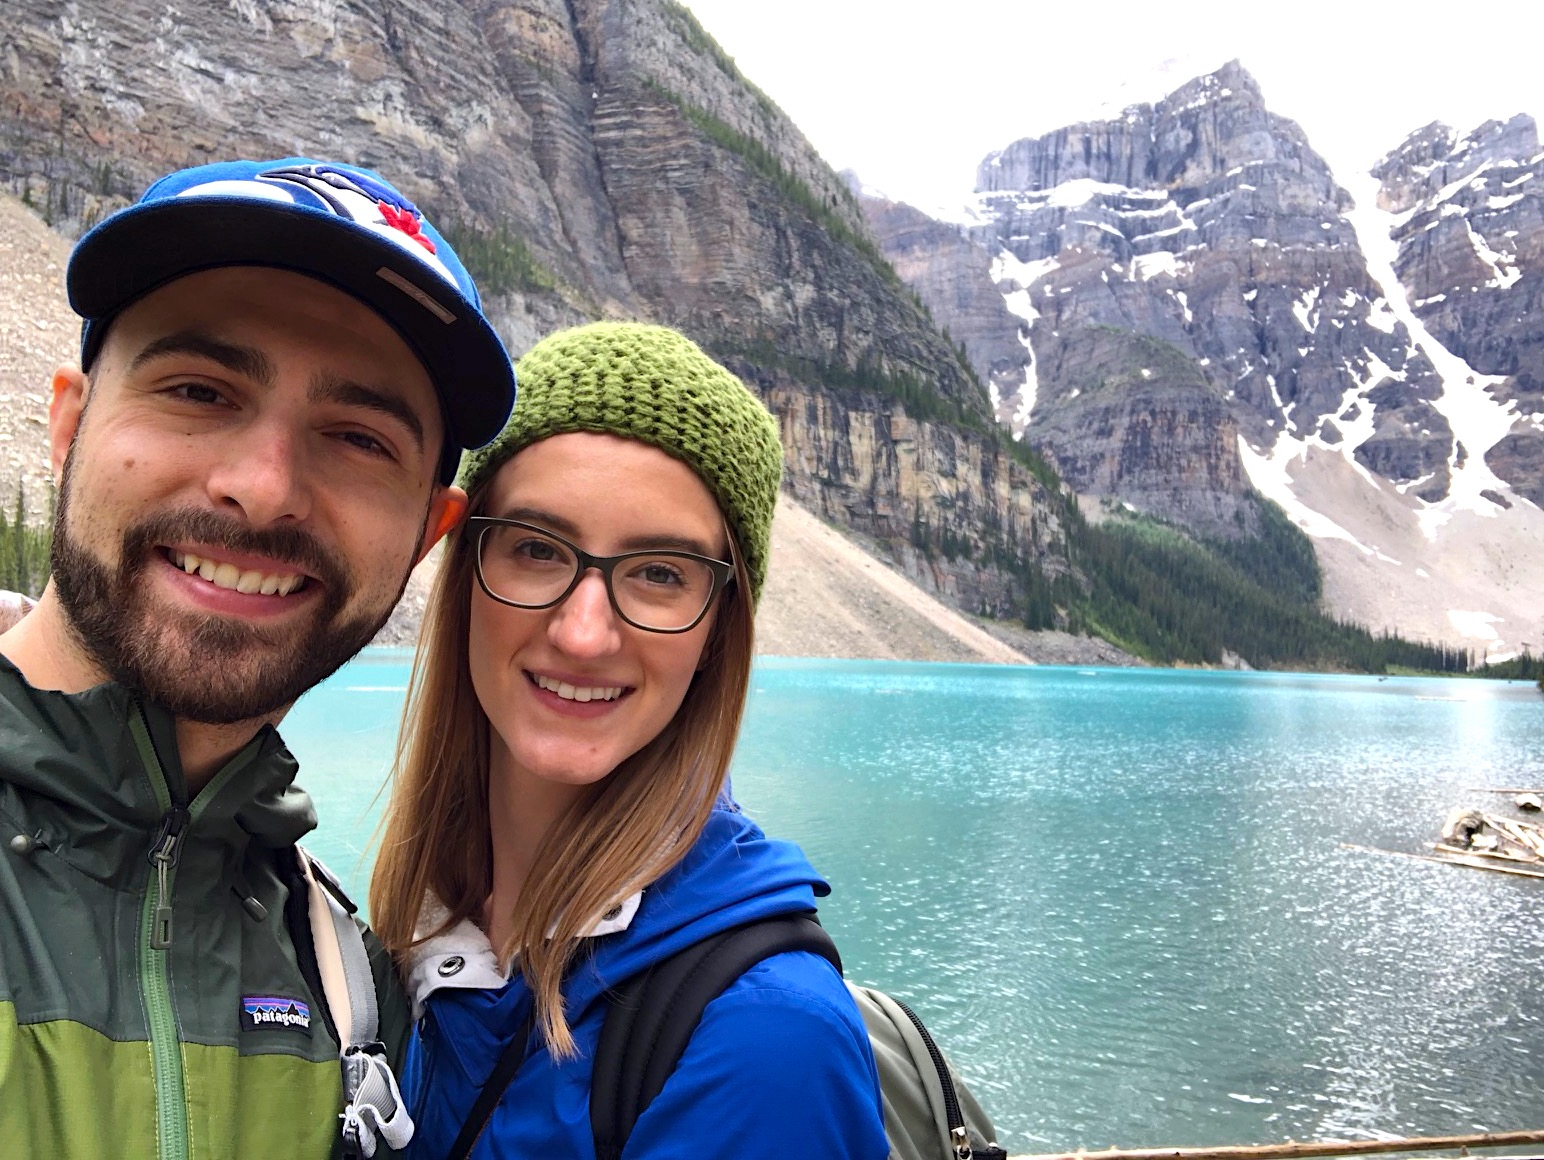 Hike Moraine Lake